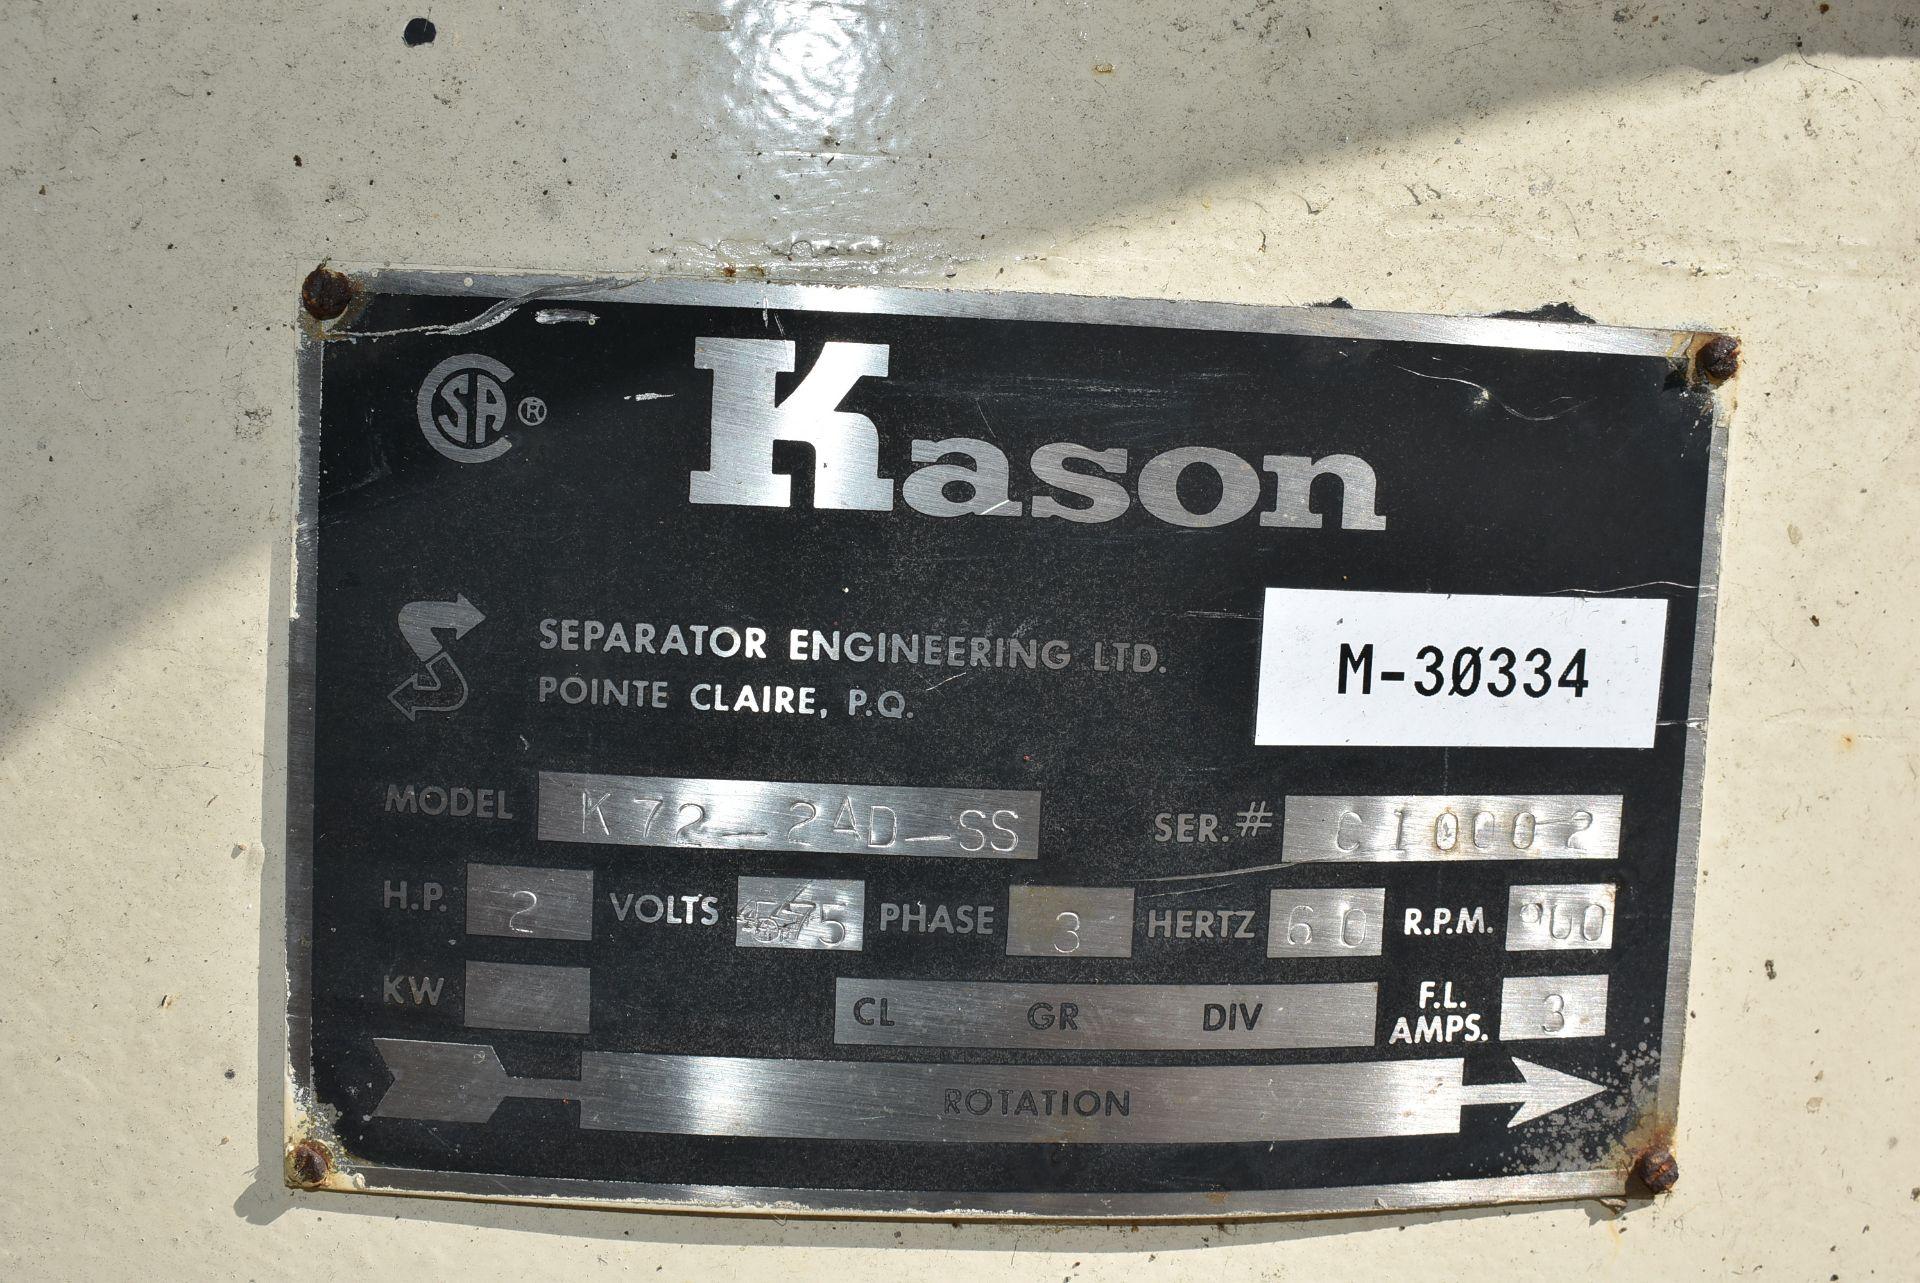 Kason Model #K72-2AD-SS Vibratory Separator - Image 2 of 2